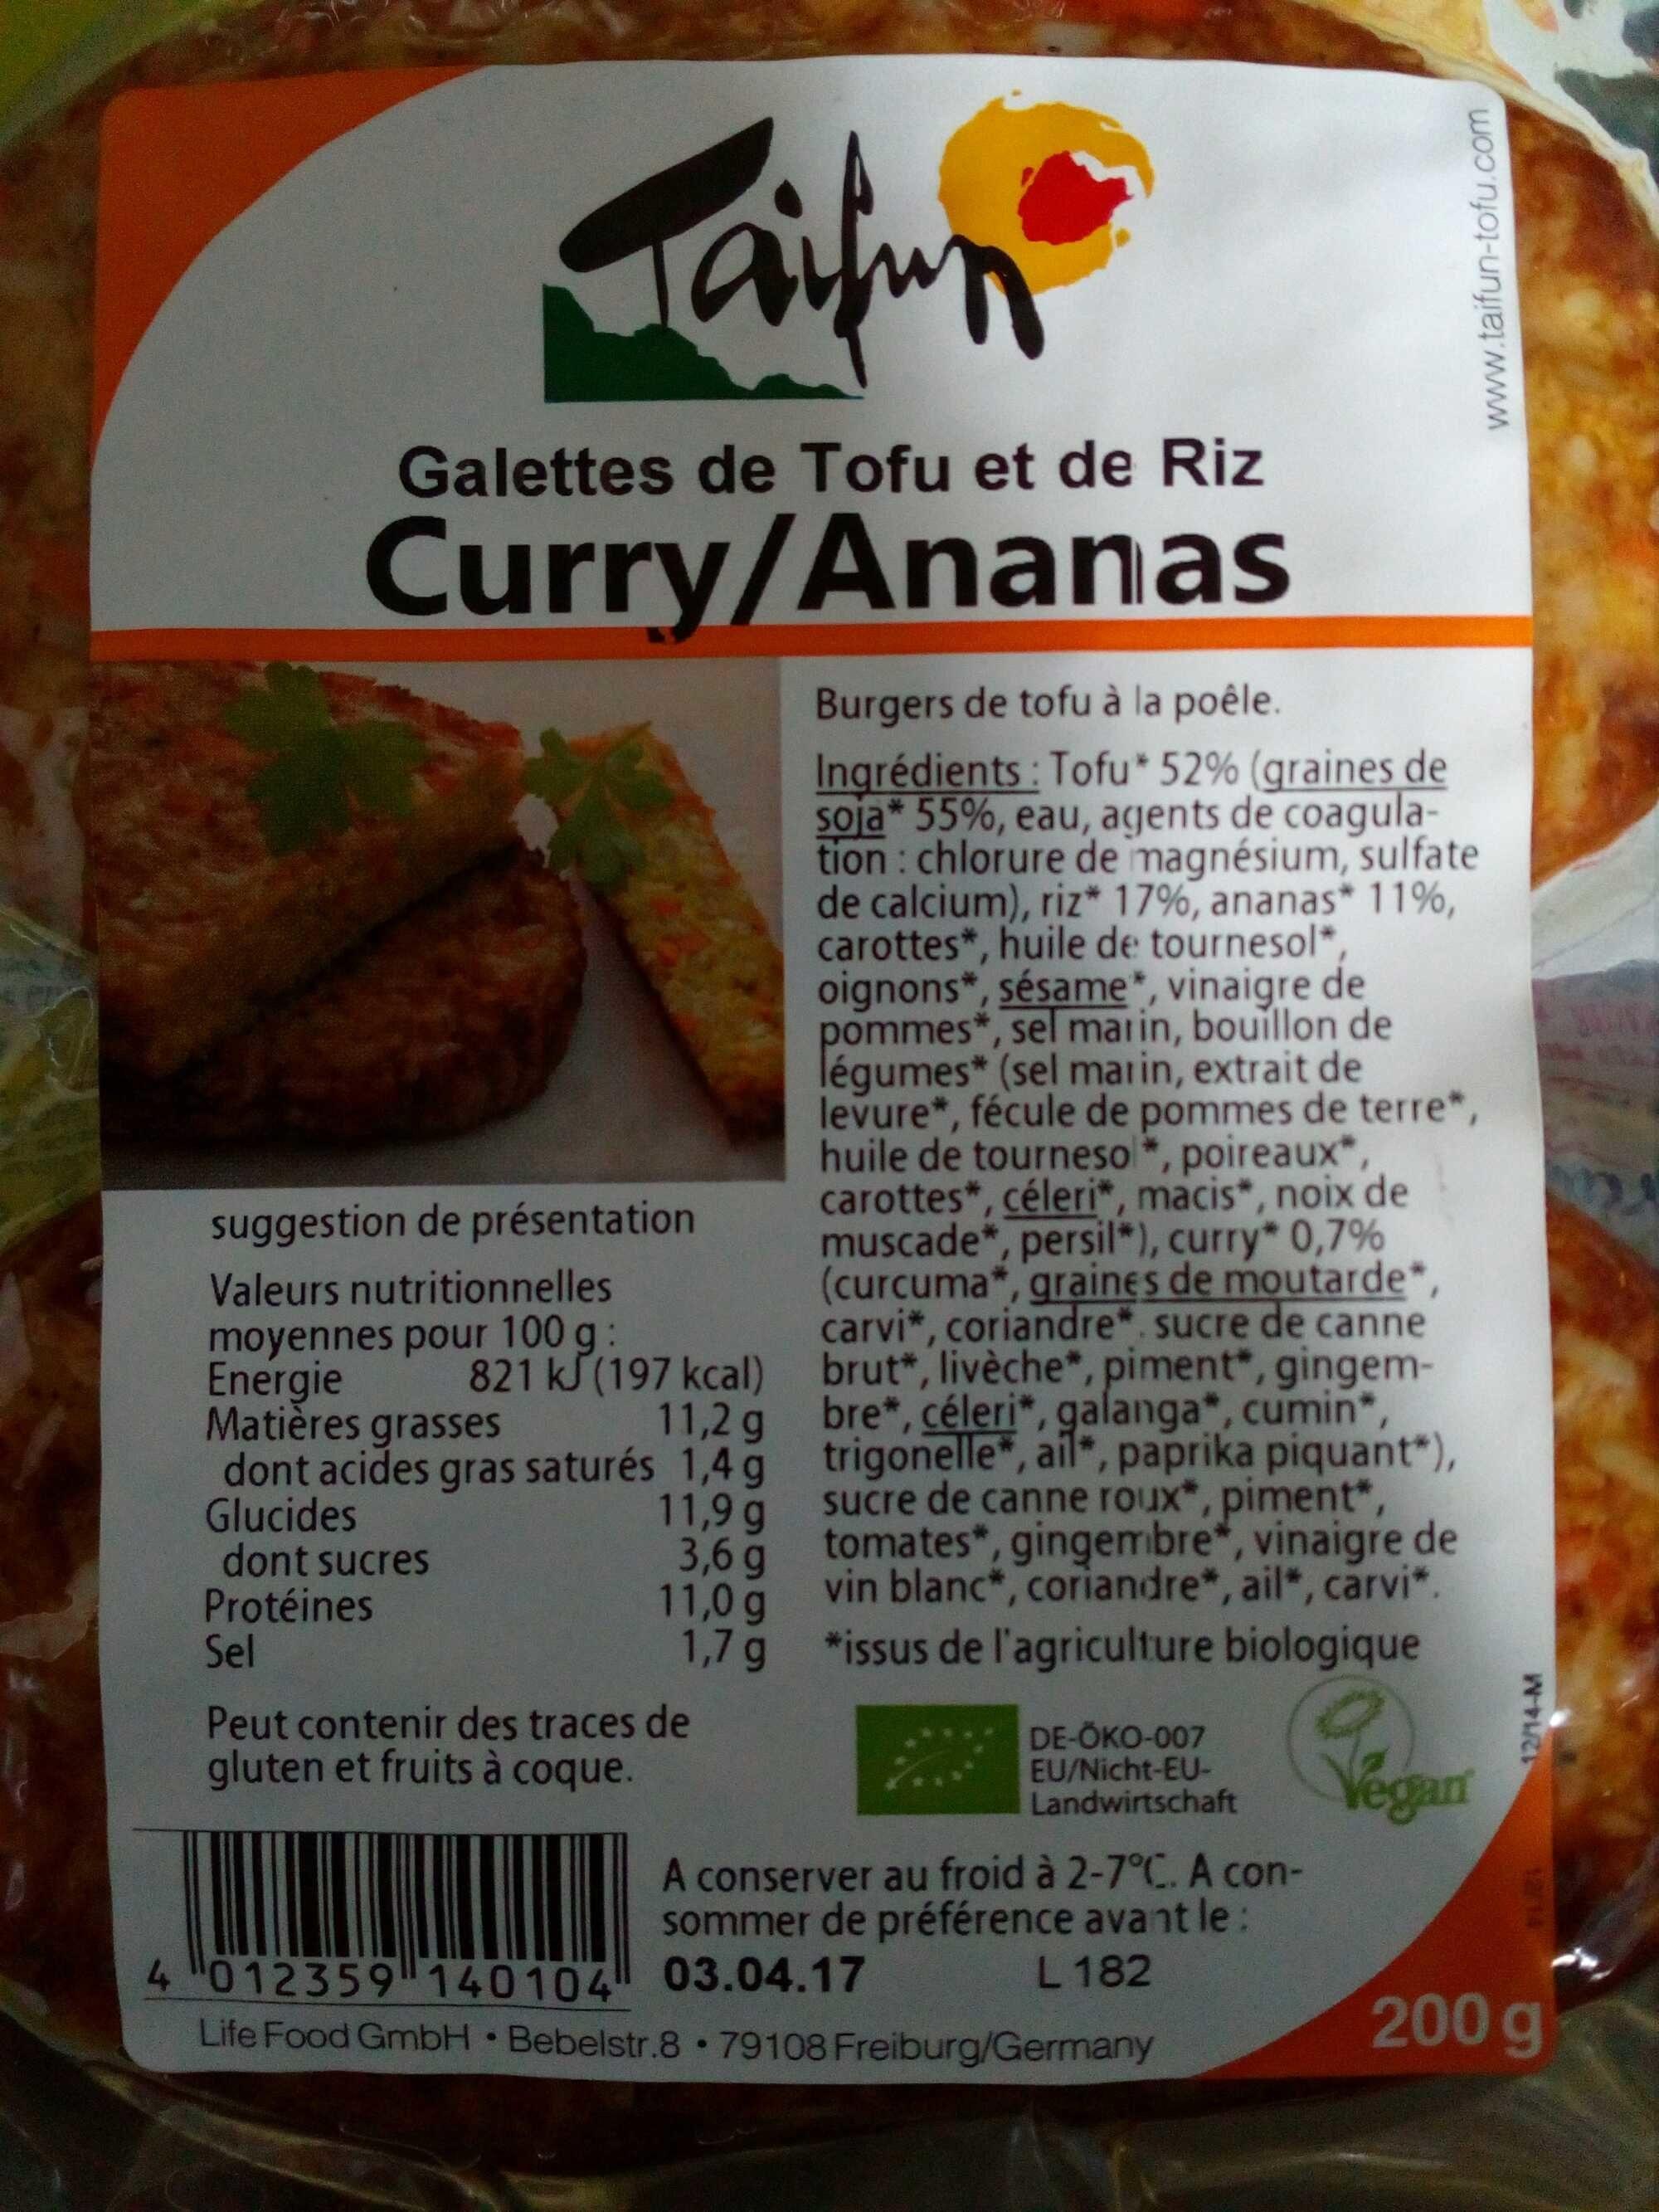 Galettes de tofu et de riz curry/ ananas - Producto - es